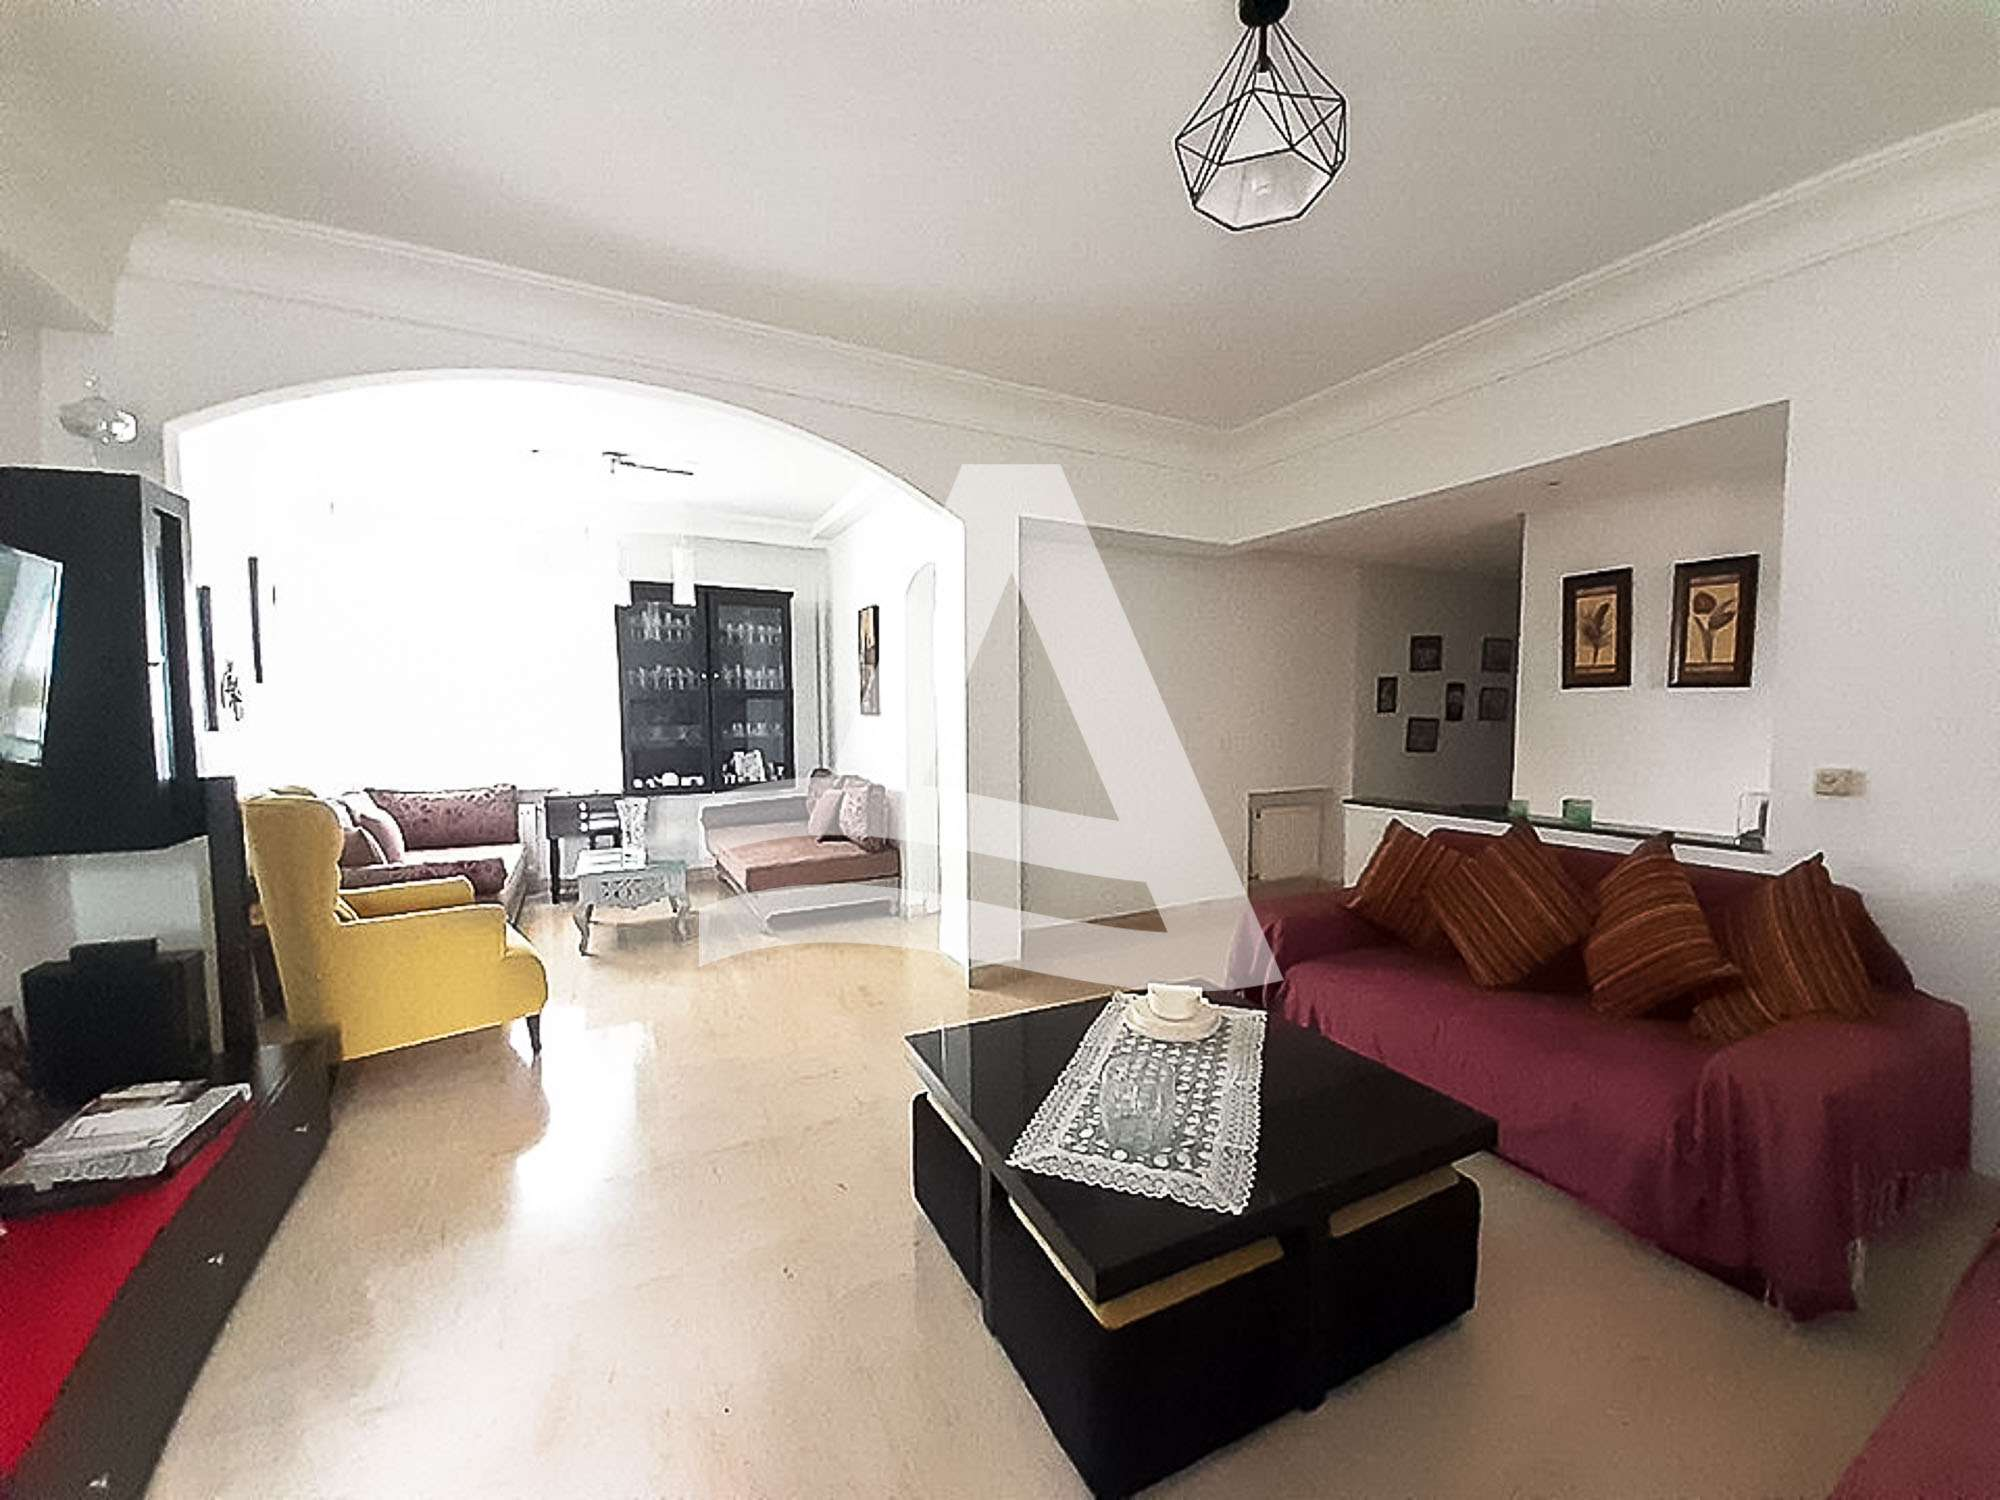 httpss3.amazonaws.comlogimoaws_Arcane_immobilière_la_Marsa-_location_-_vente_la_marsa_12_sur_16_1574071698440-1